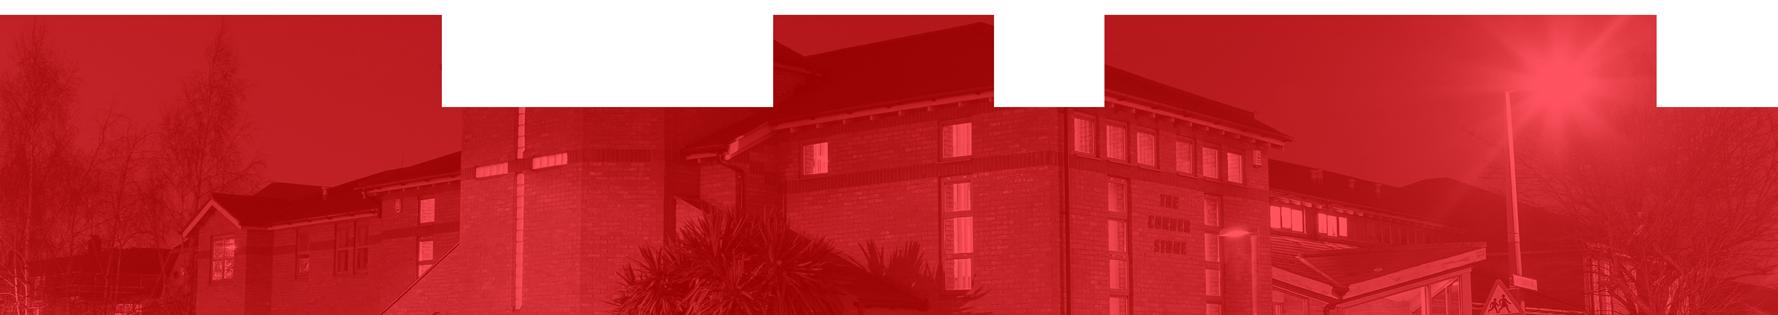 history skyline